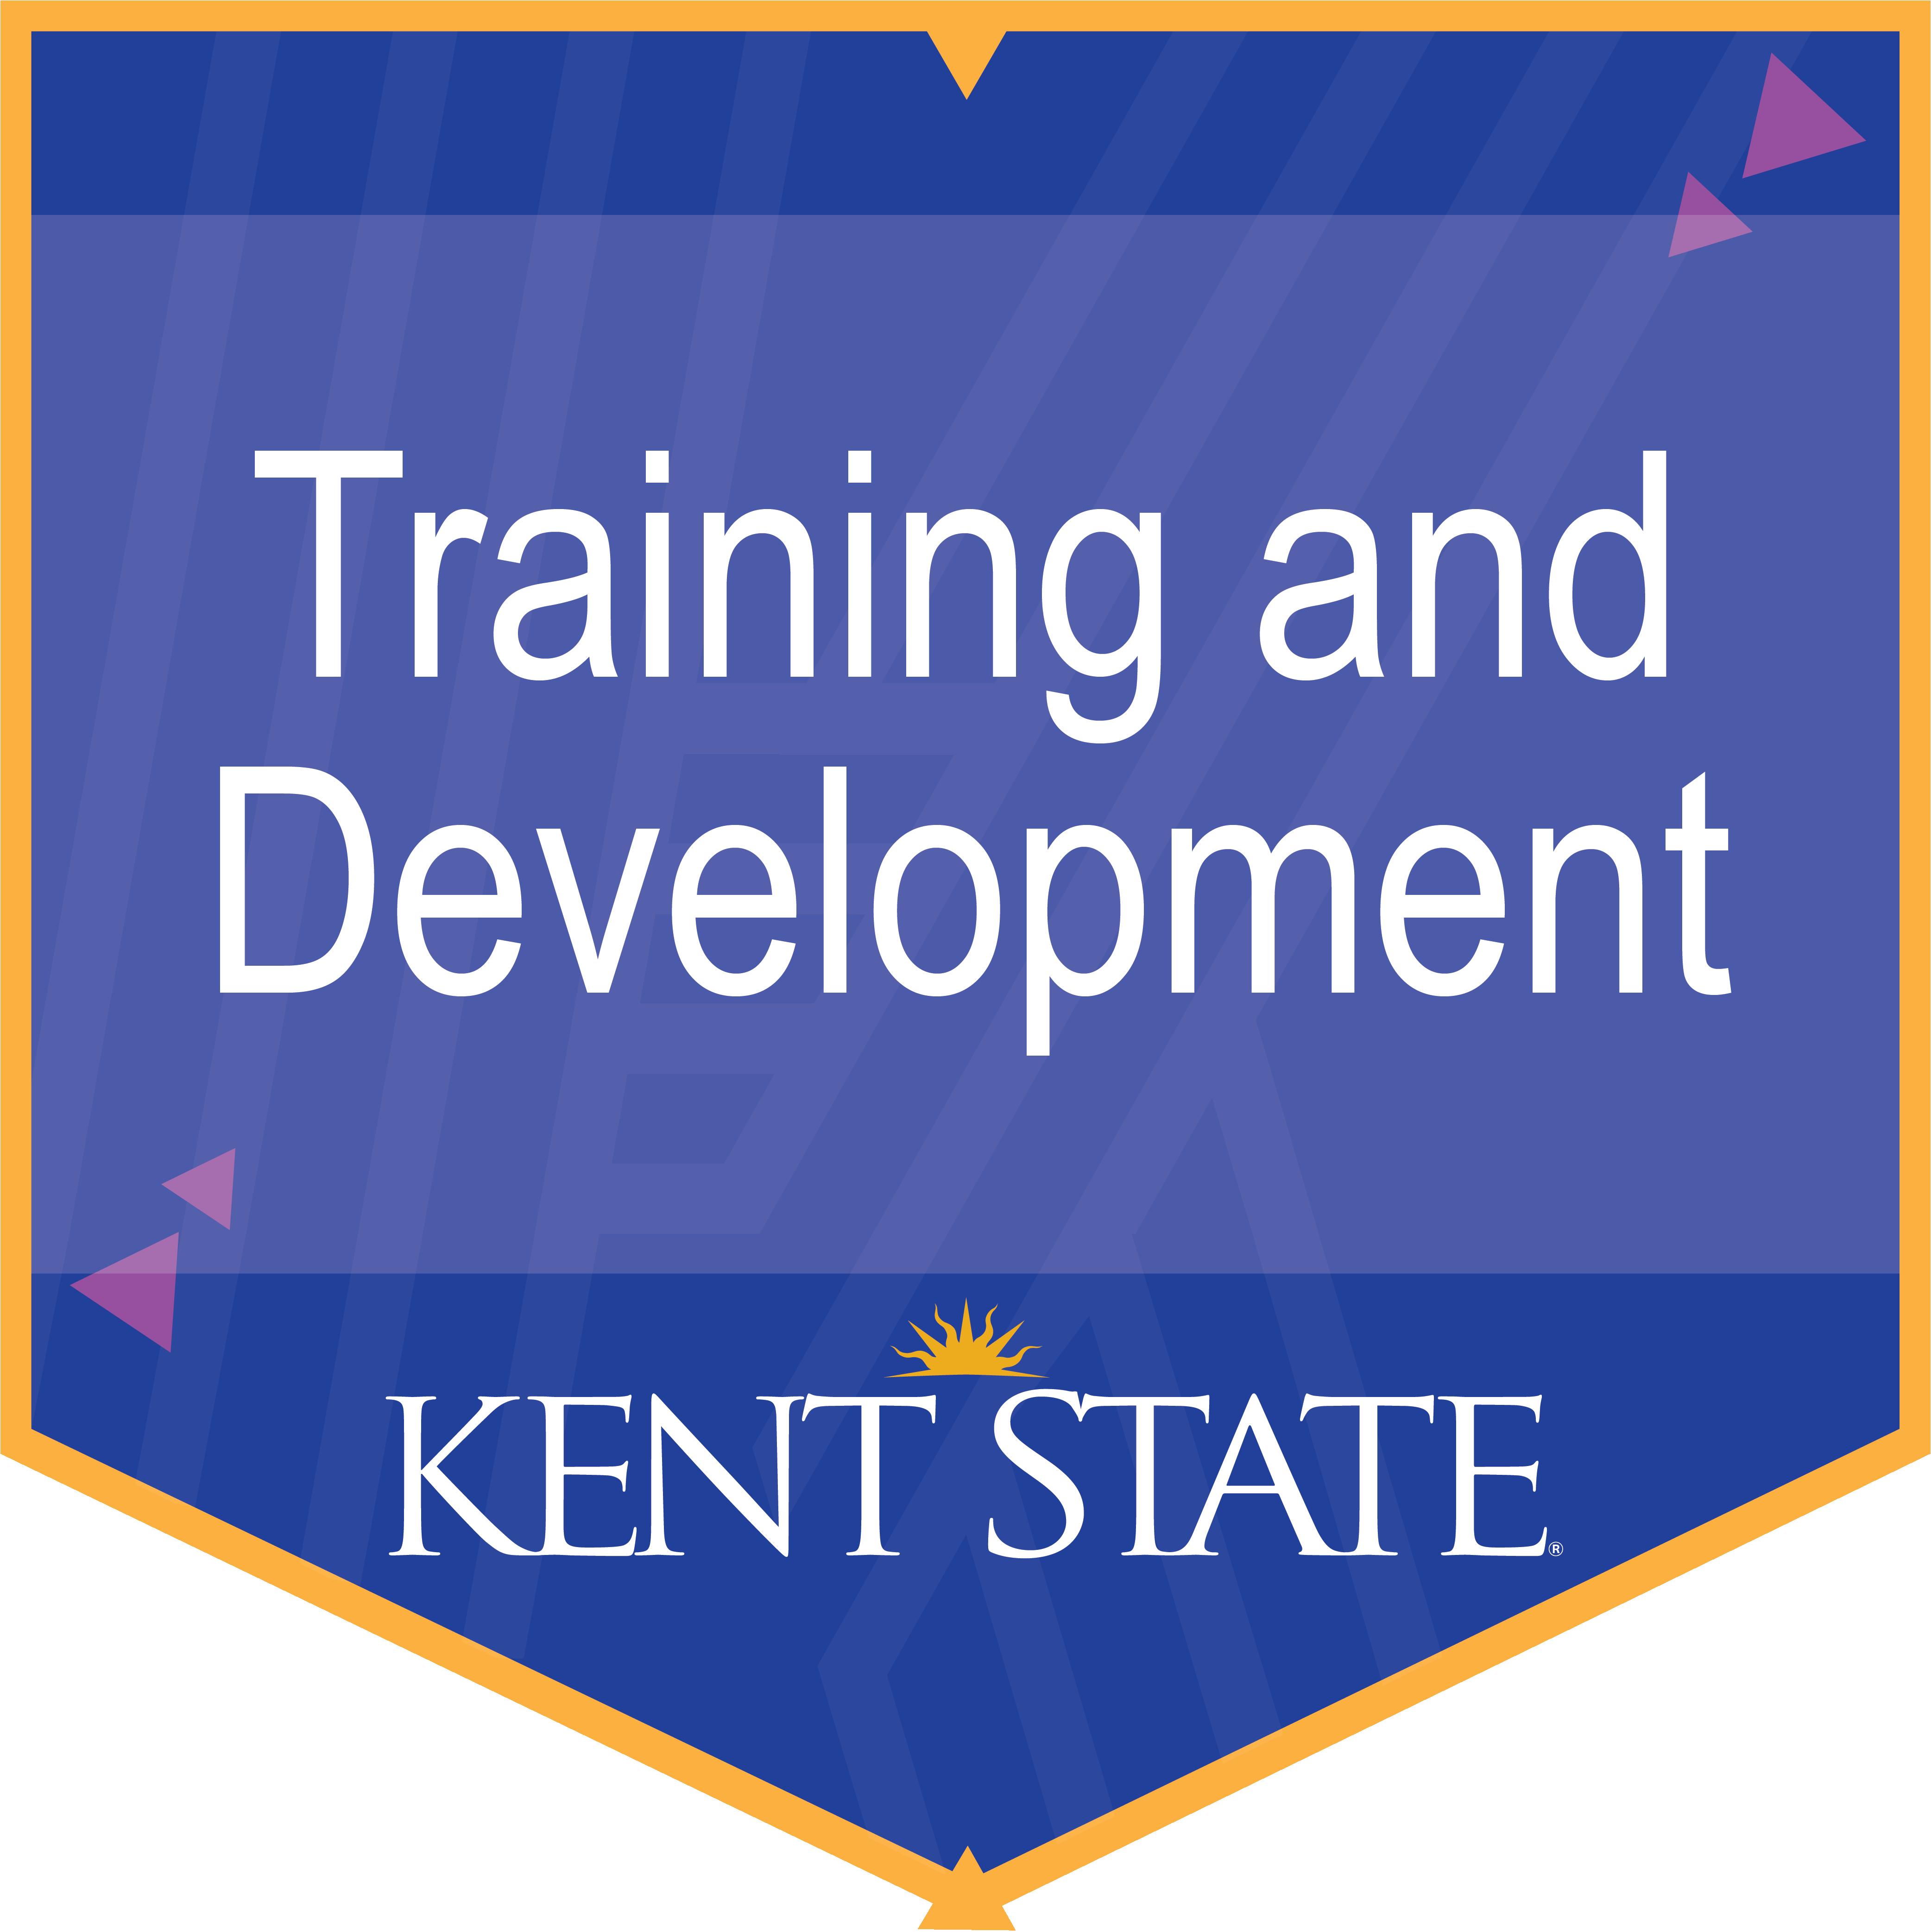 Certificate of Training and Development Digital Badge